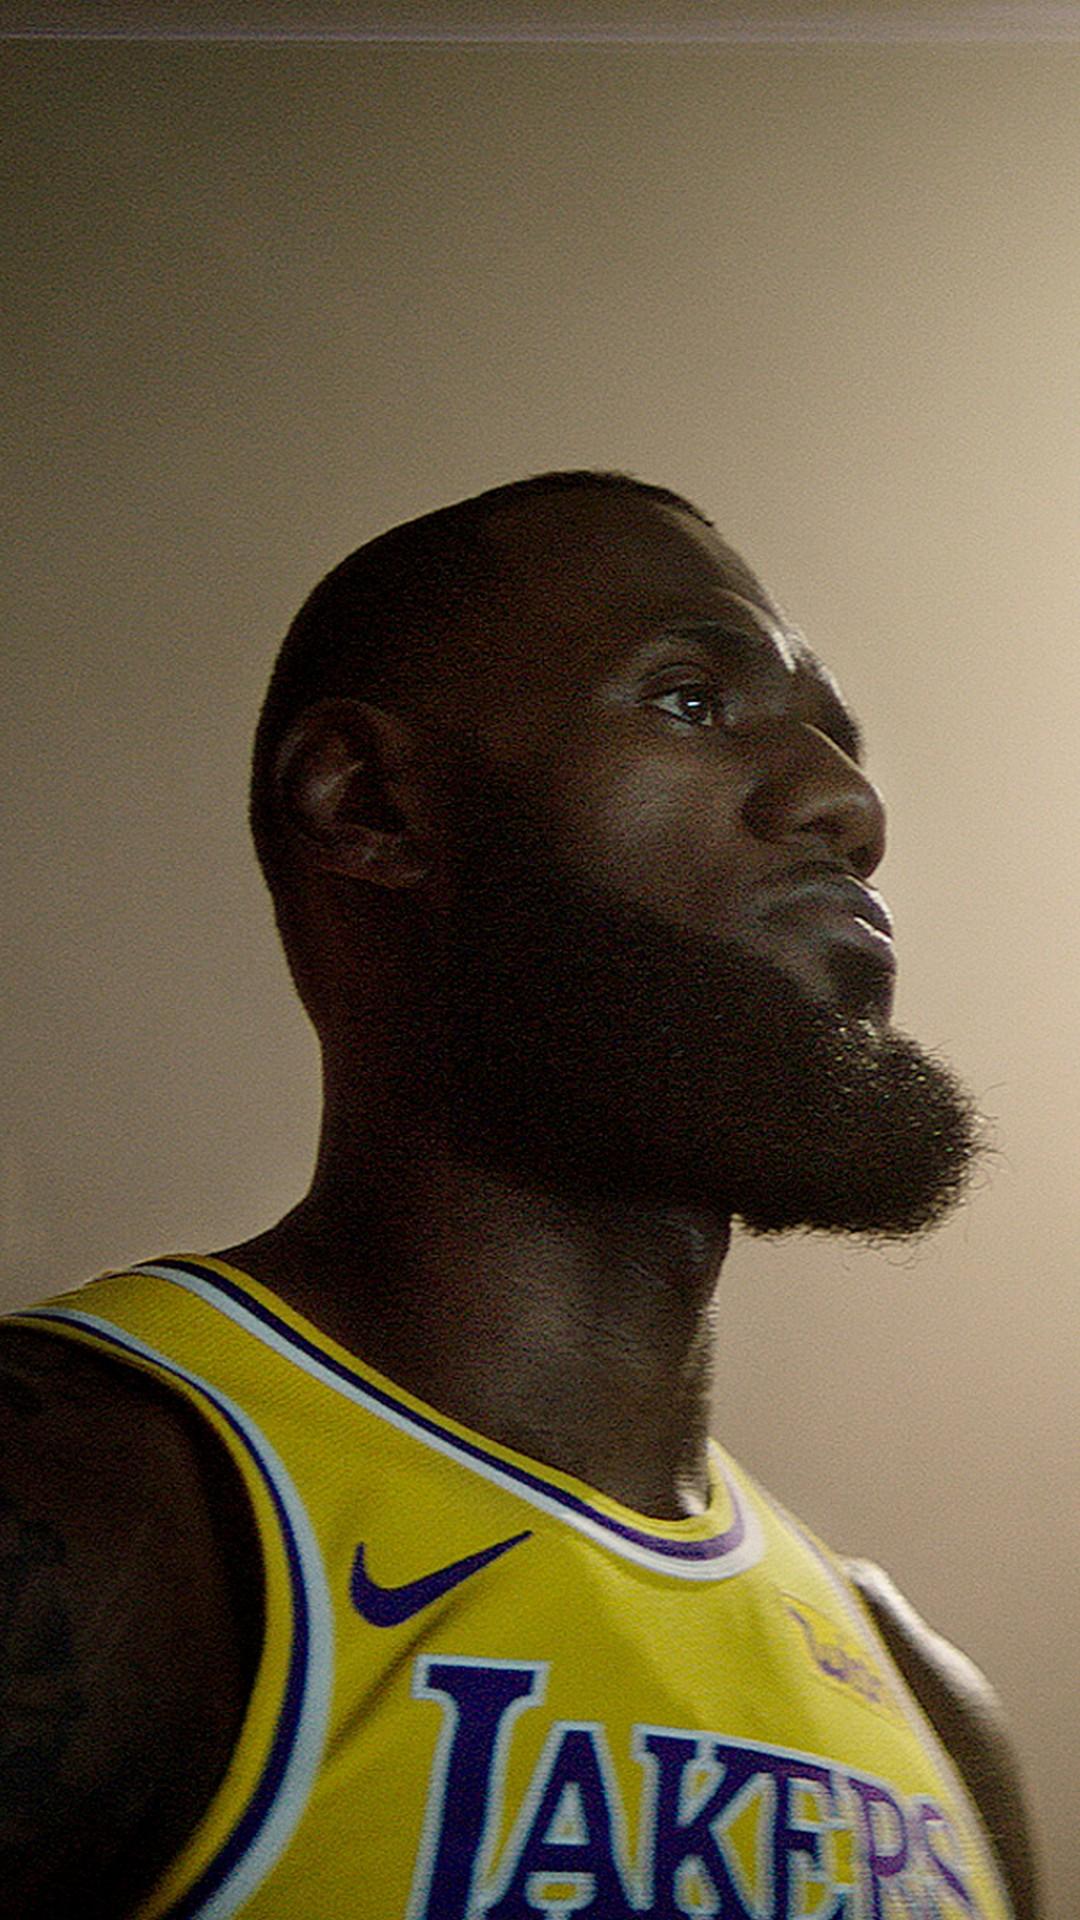 LeBron James LA Lakers iPhone 7 Plus Wallpaper 2020 Basketball 1080x1920